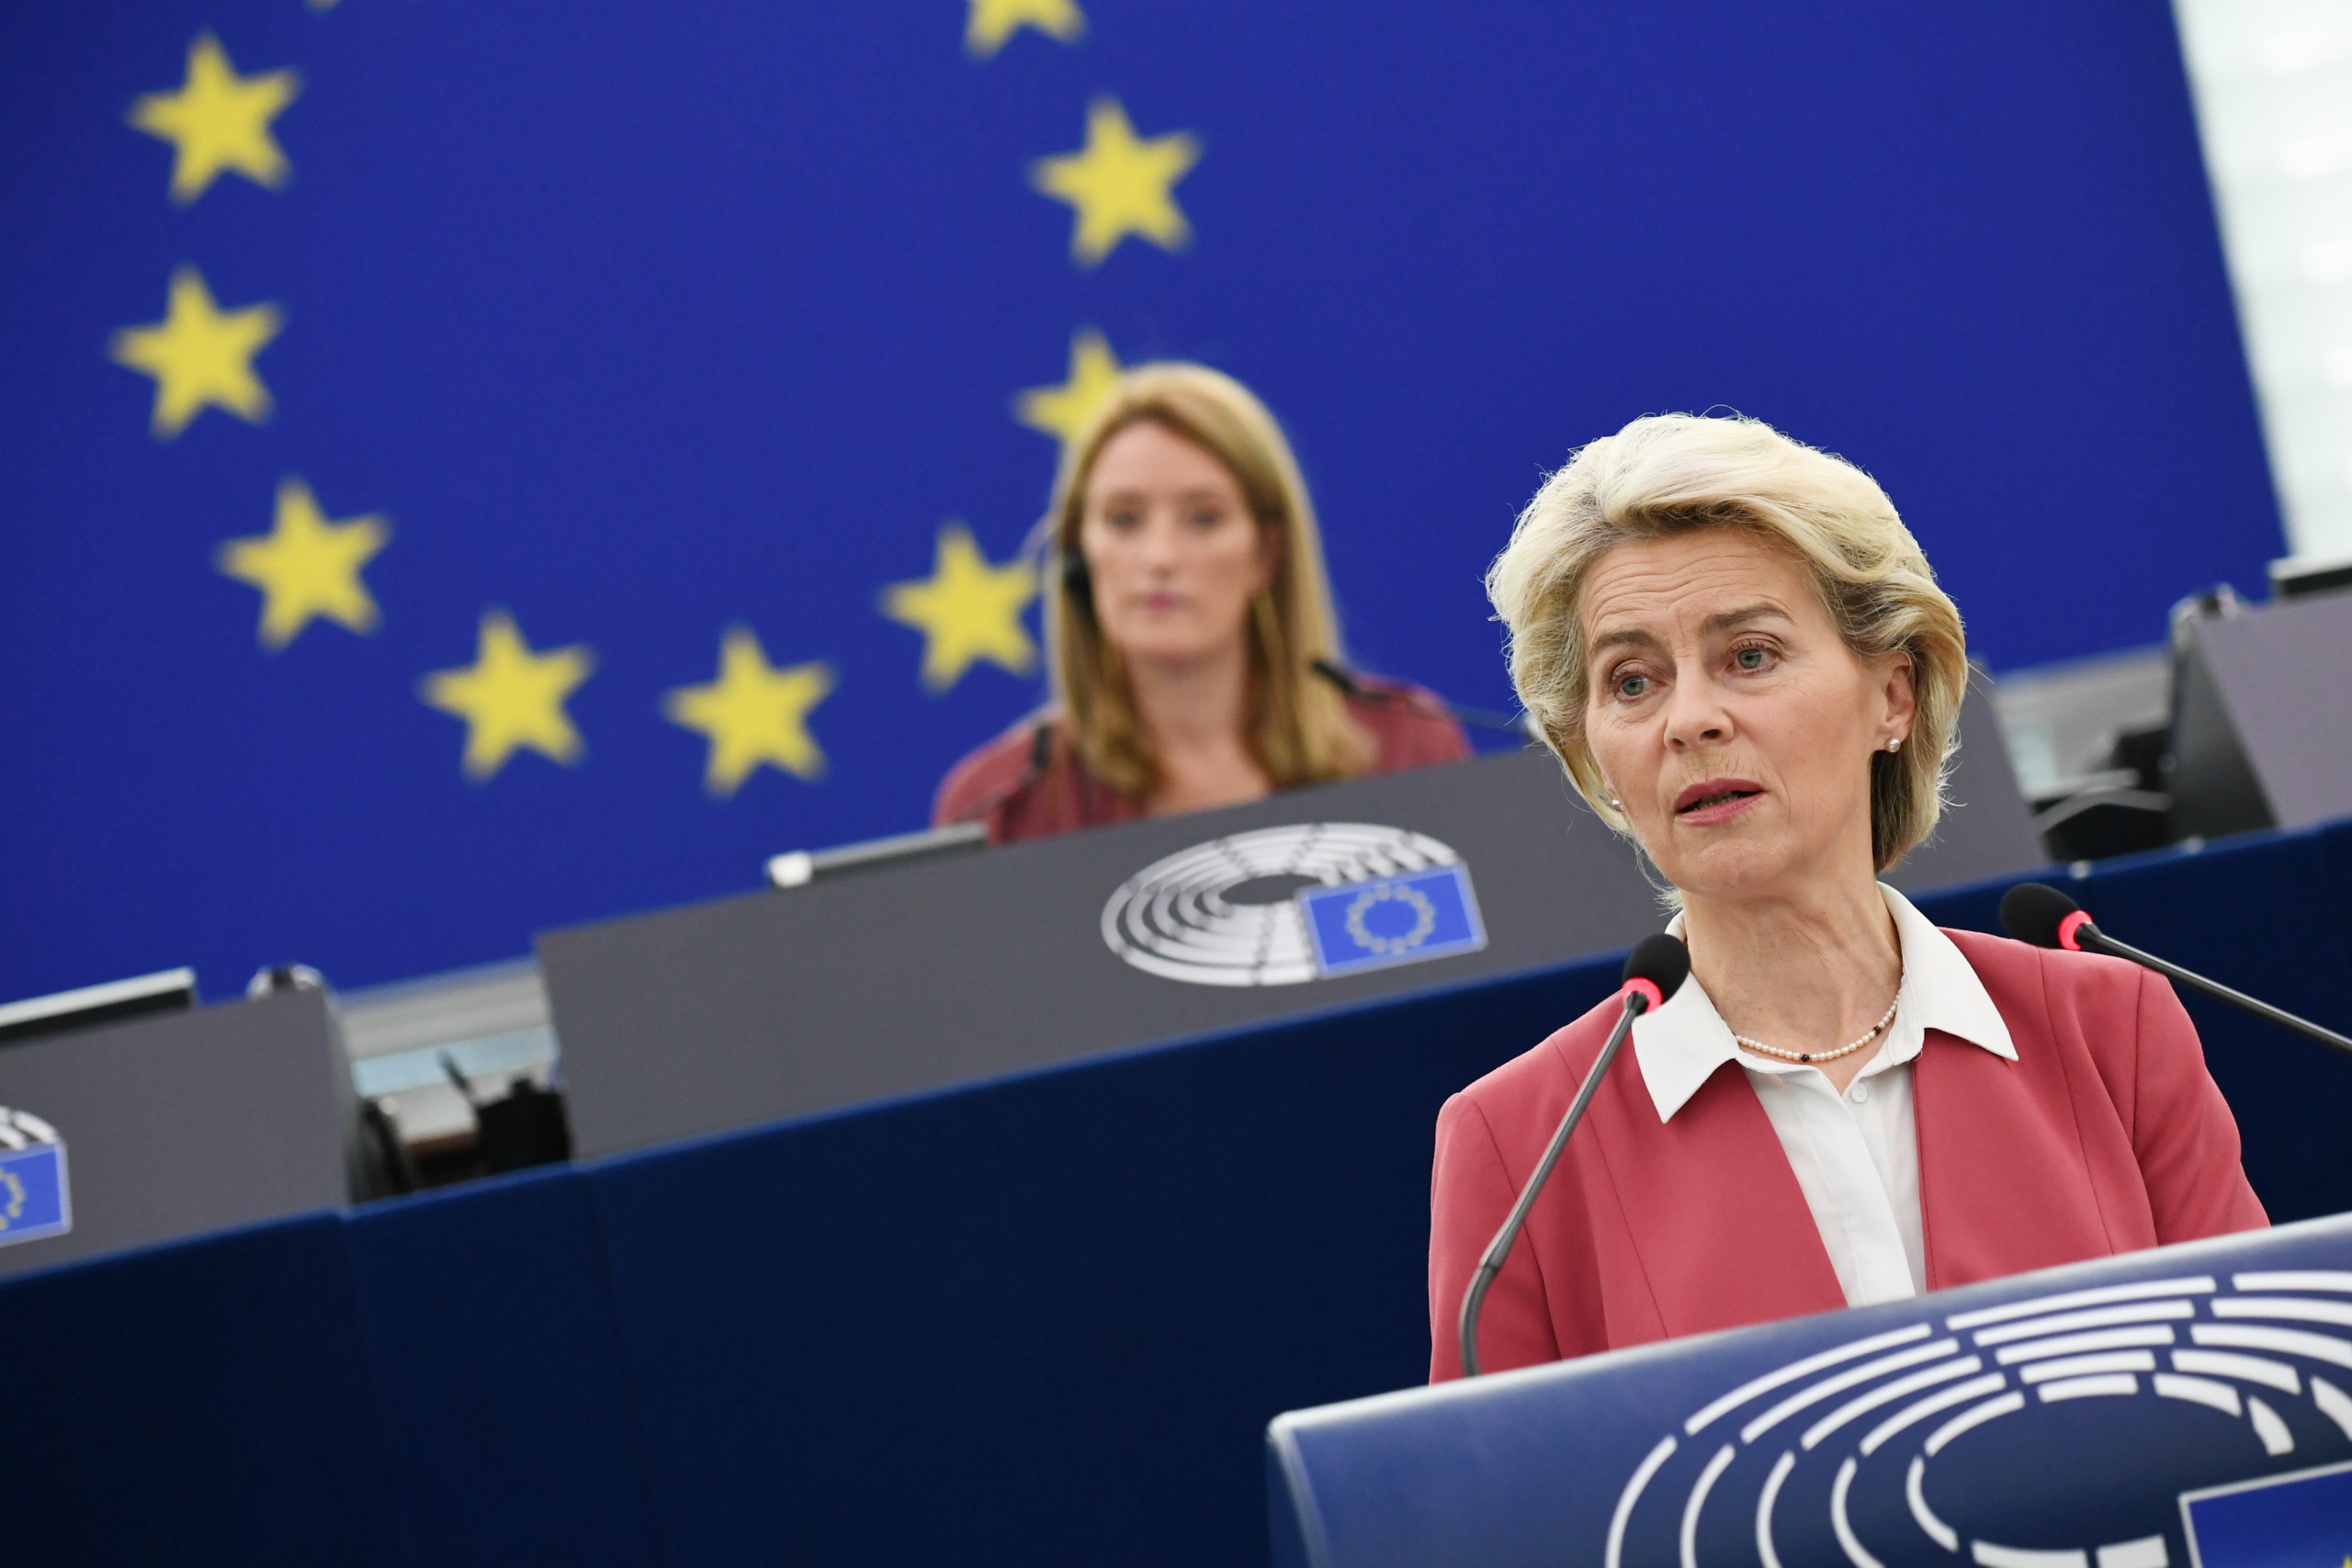 La presidenta de la Comissio Europea, Ursula von der Leyen | ACN